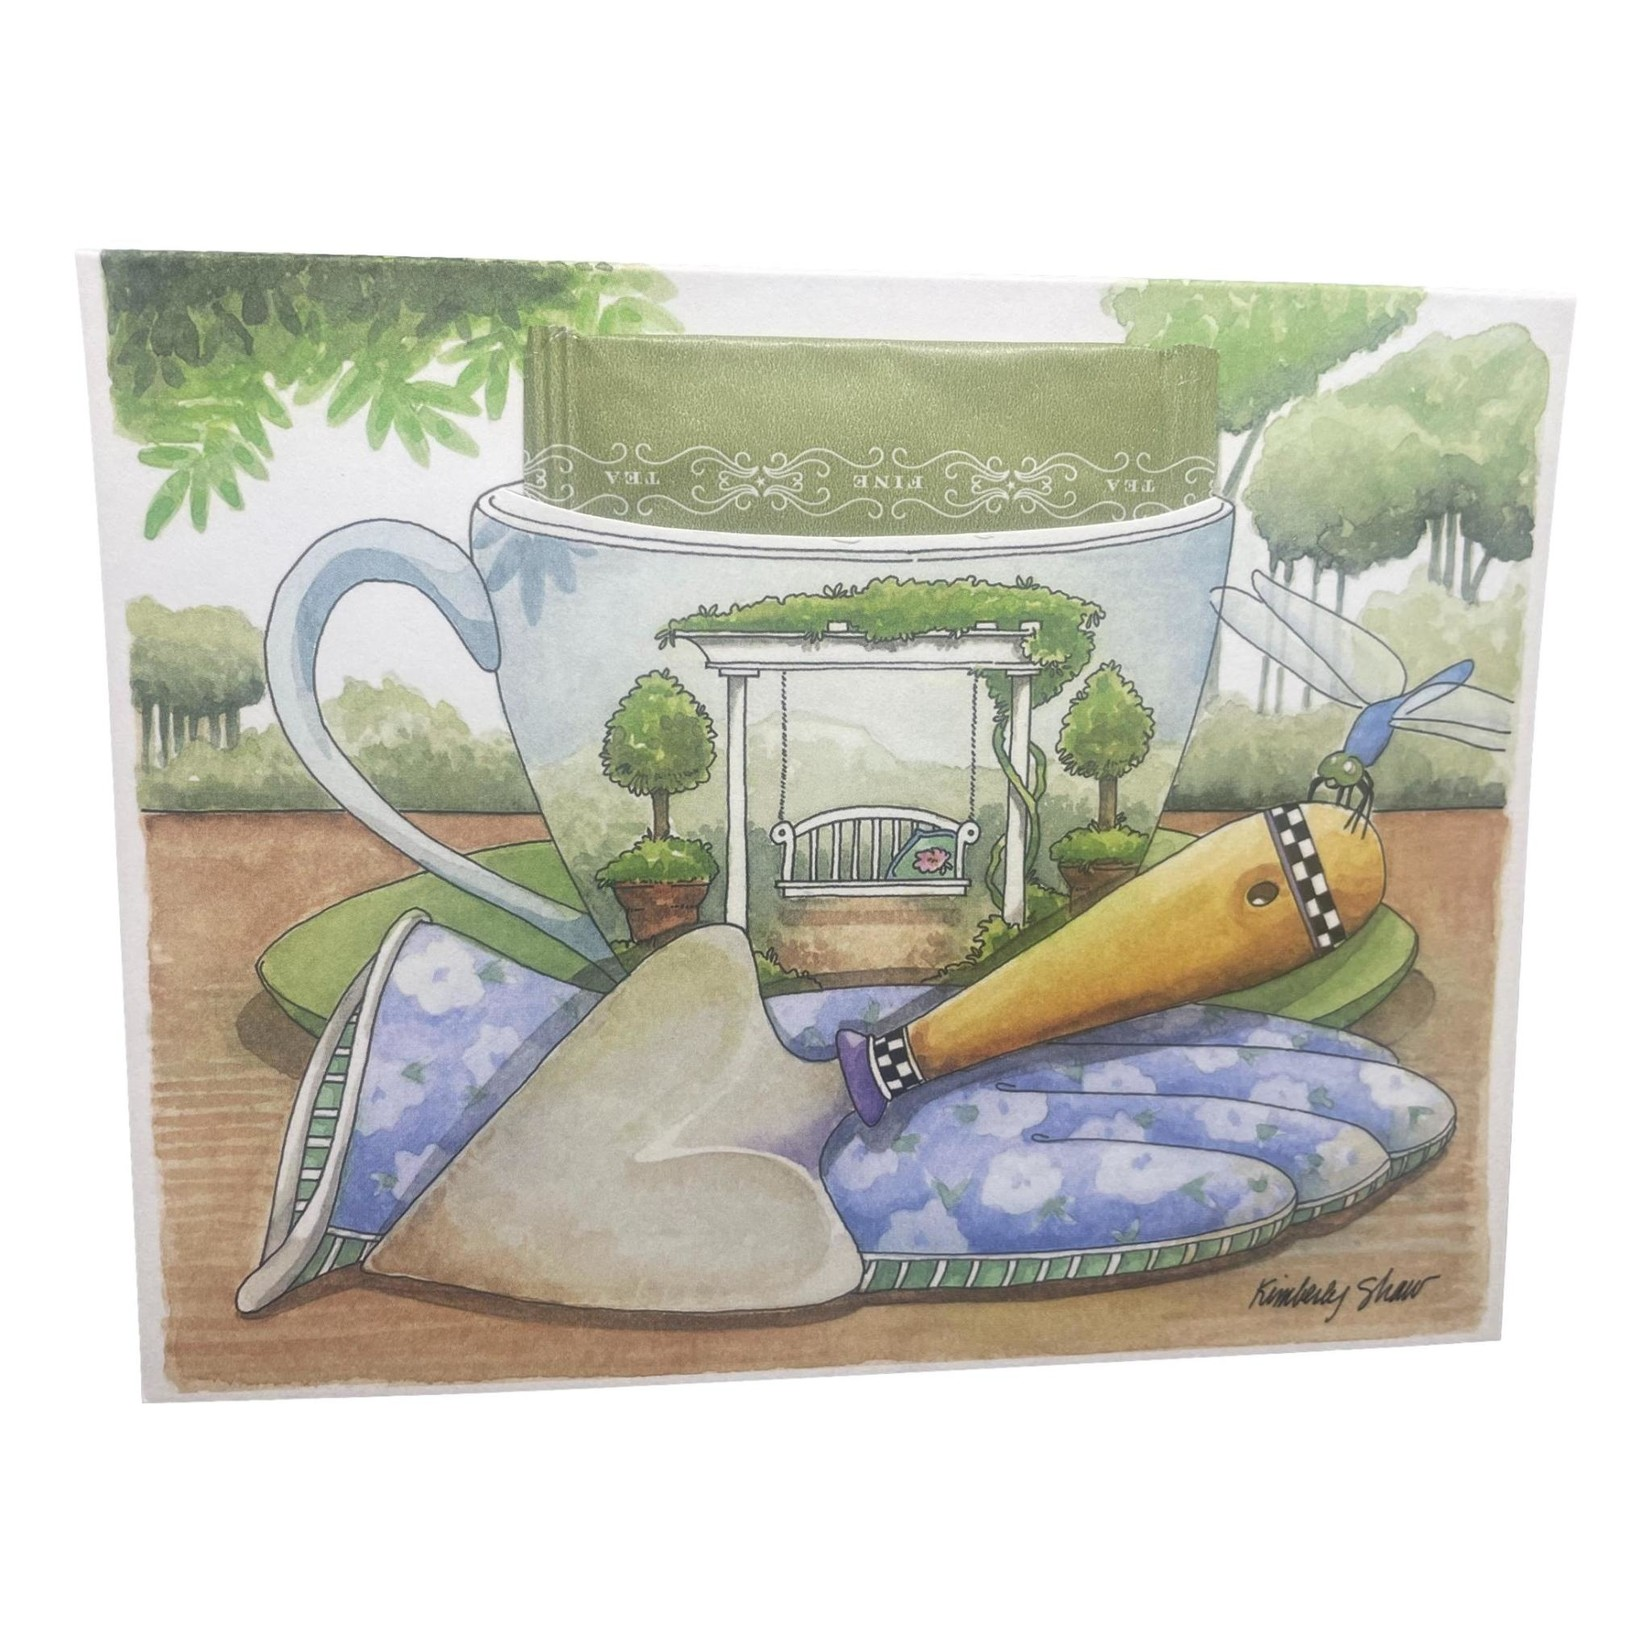 Kimberly Shaw Garden Teacup Card